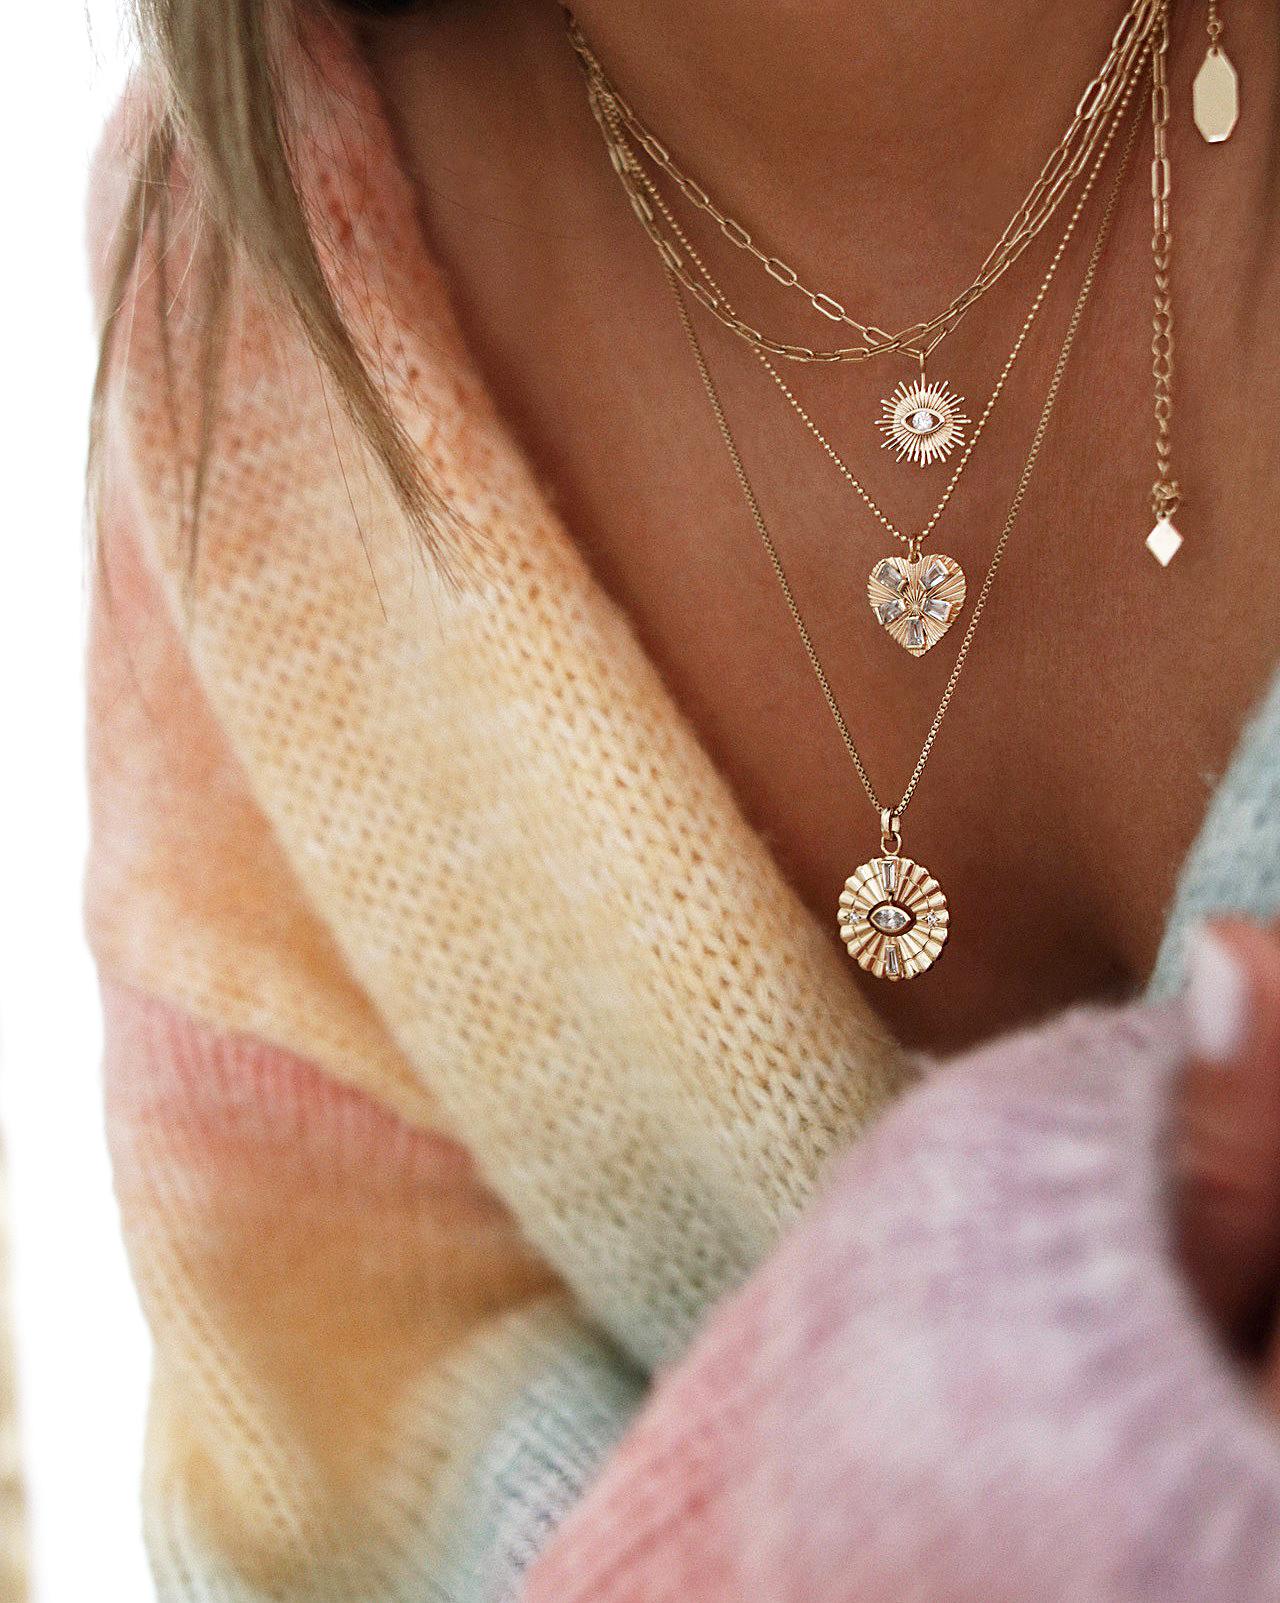 www.chonandchon.com necklaces addict, jewelry inspo